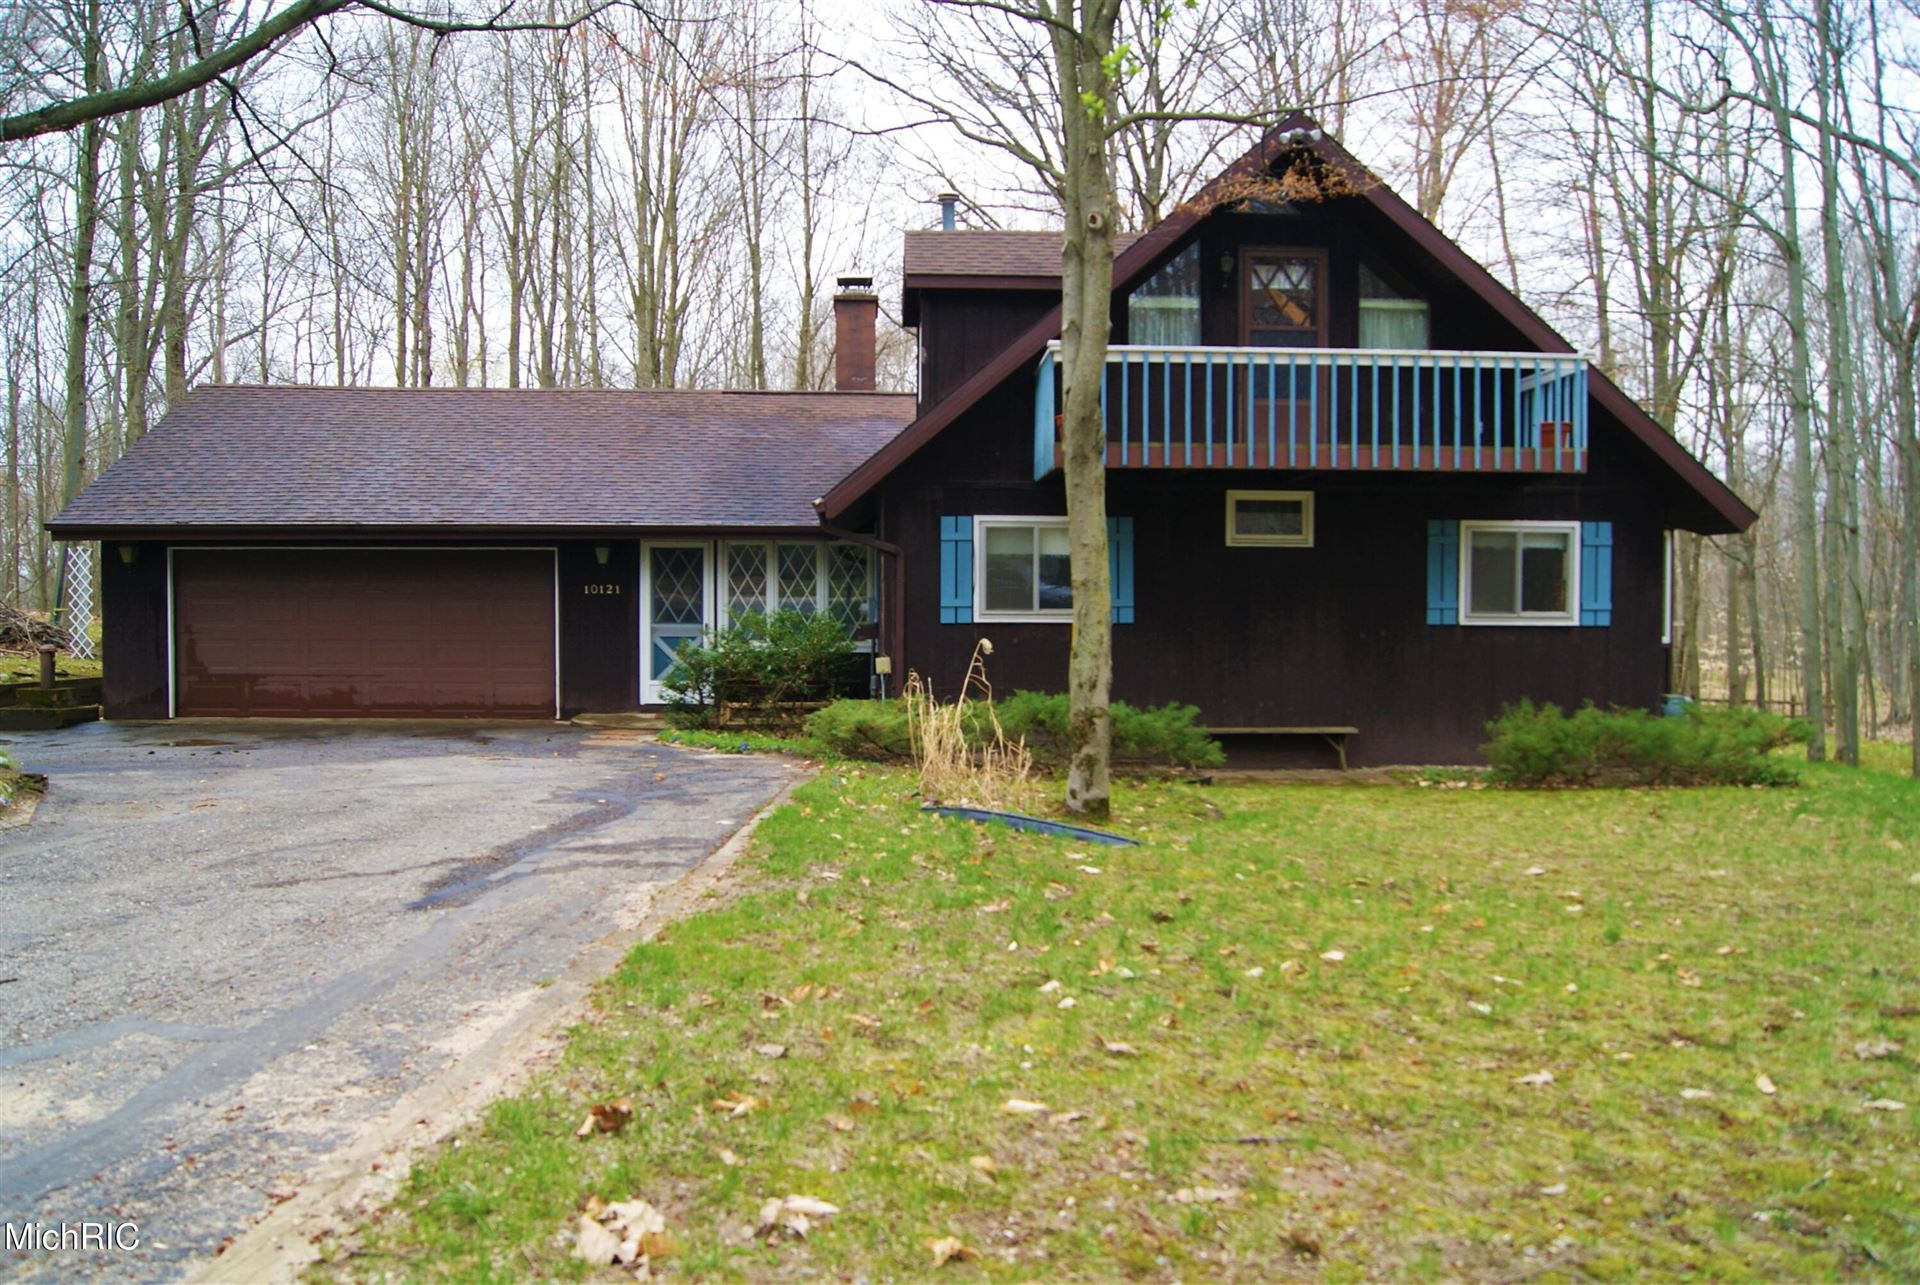 10121 Mountain View Trail, Canadian Lakes, MI 49346 - MLS#: 21013844